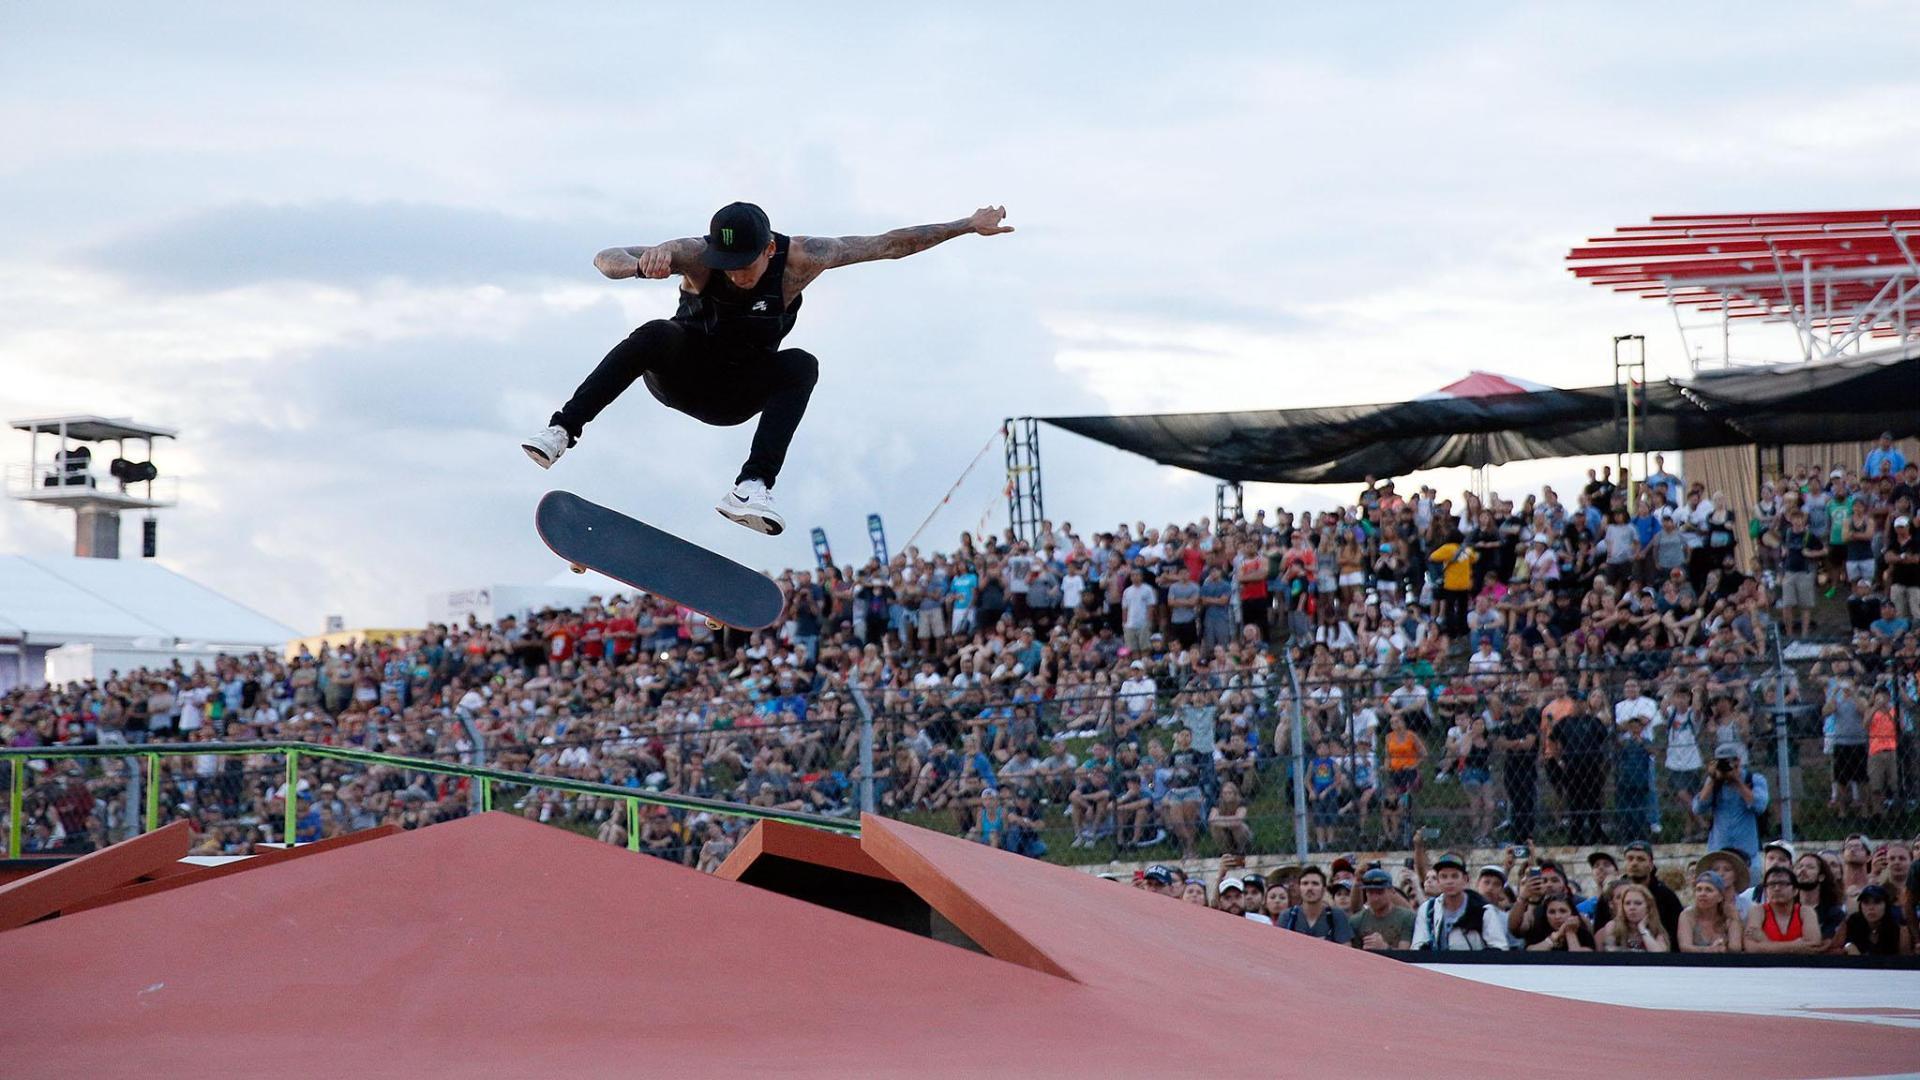 Nyjah Huston wins Men's Skateboard Street silver